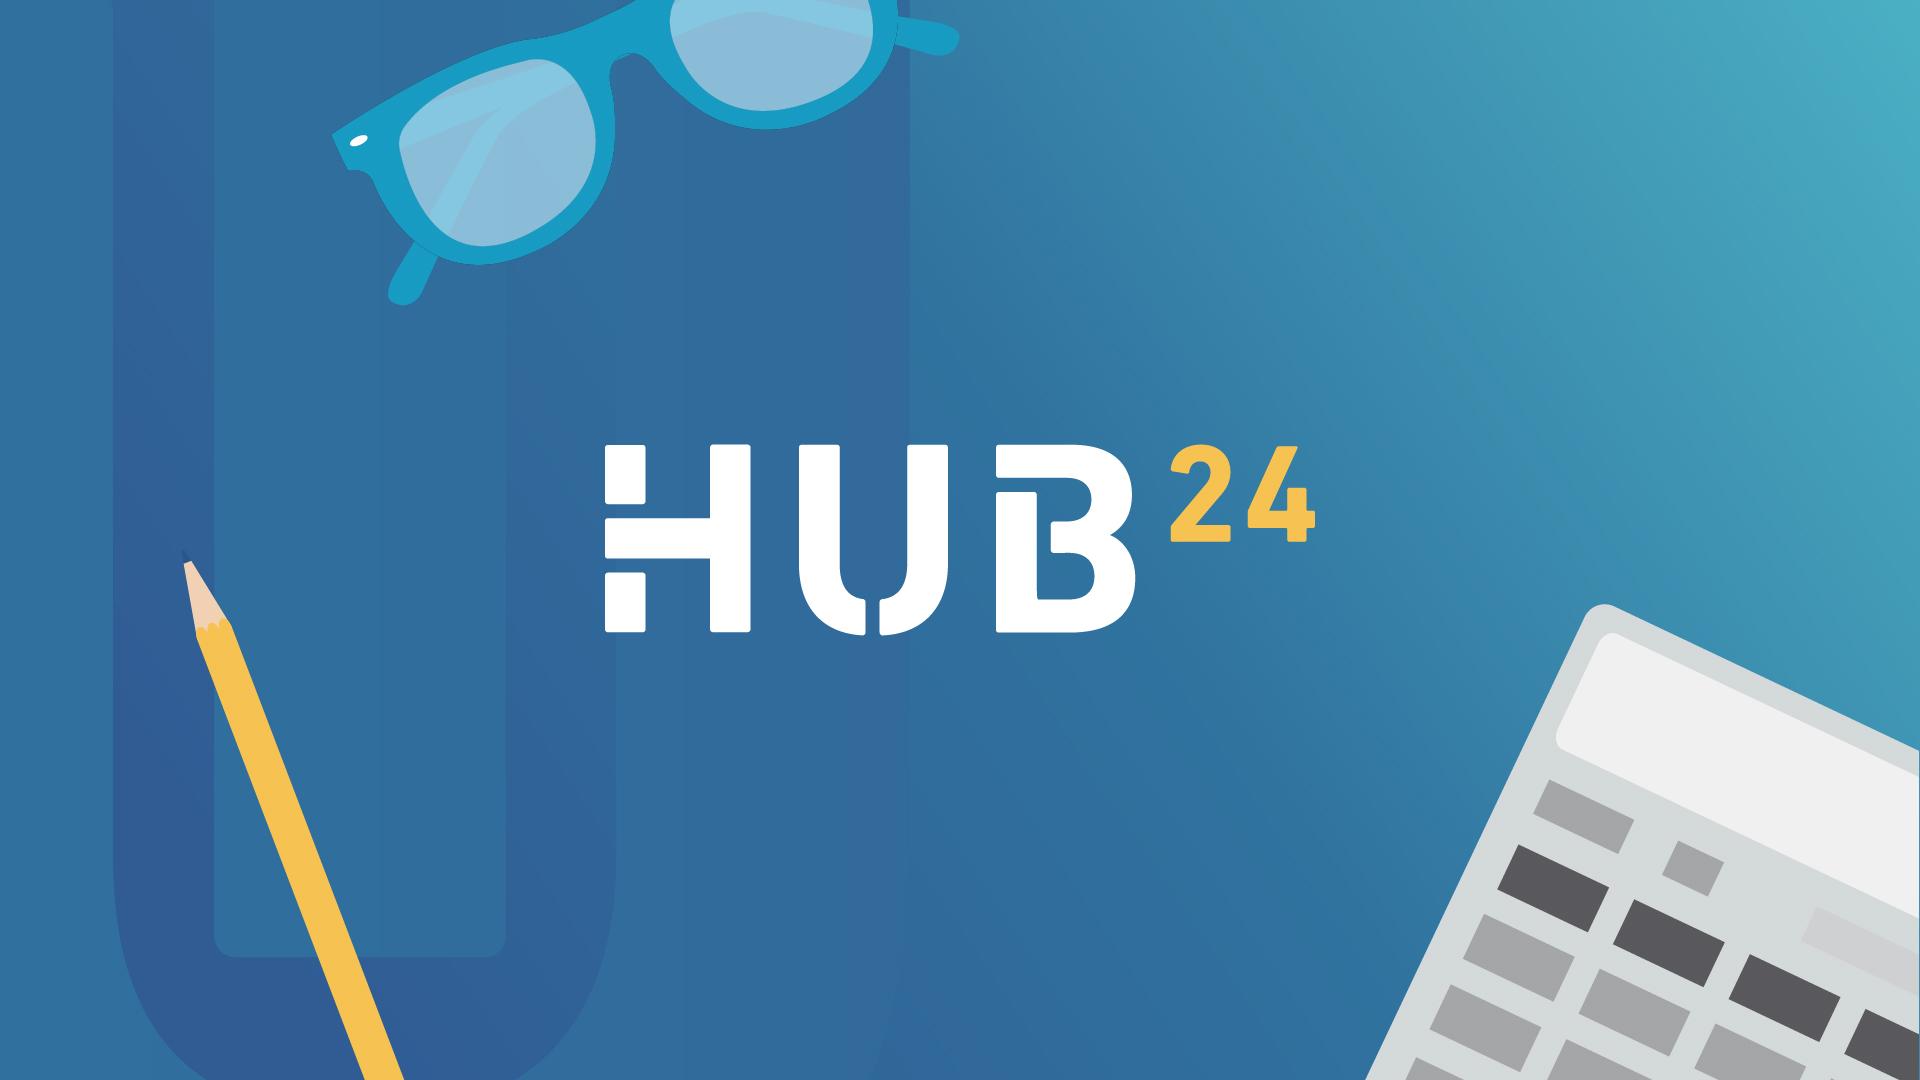 HUB24